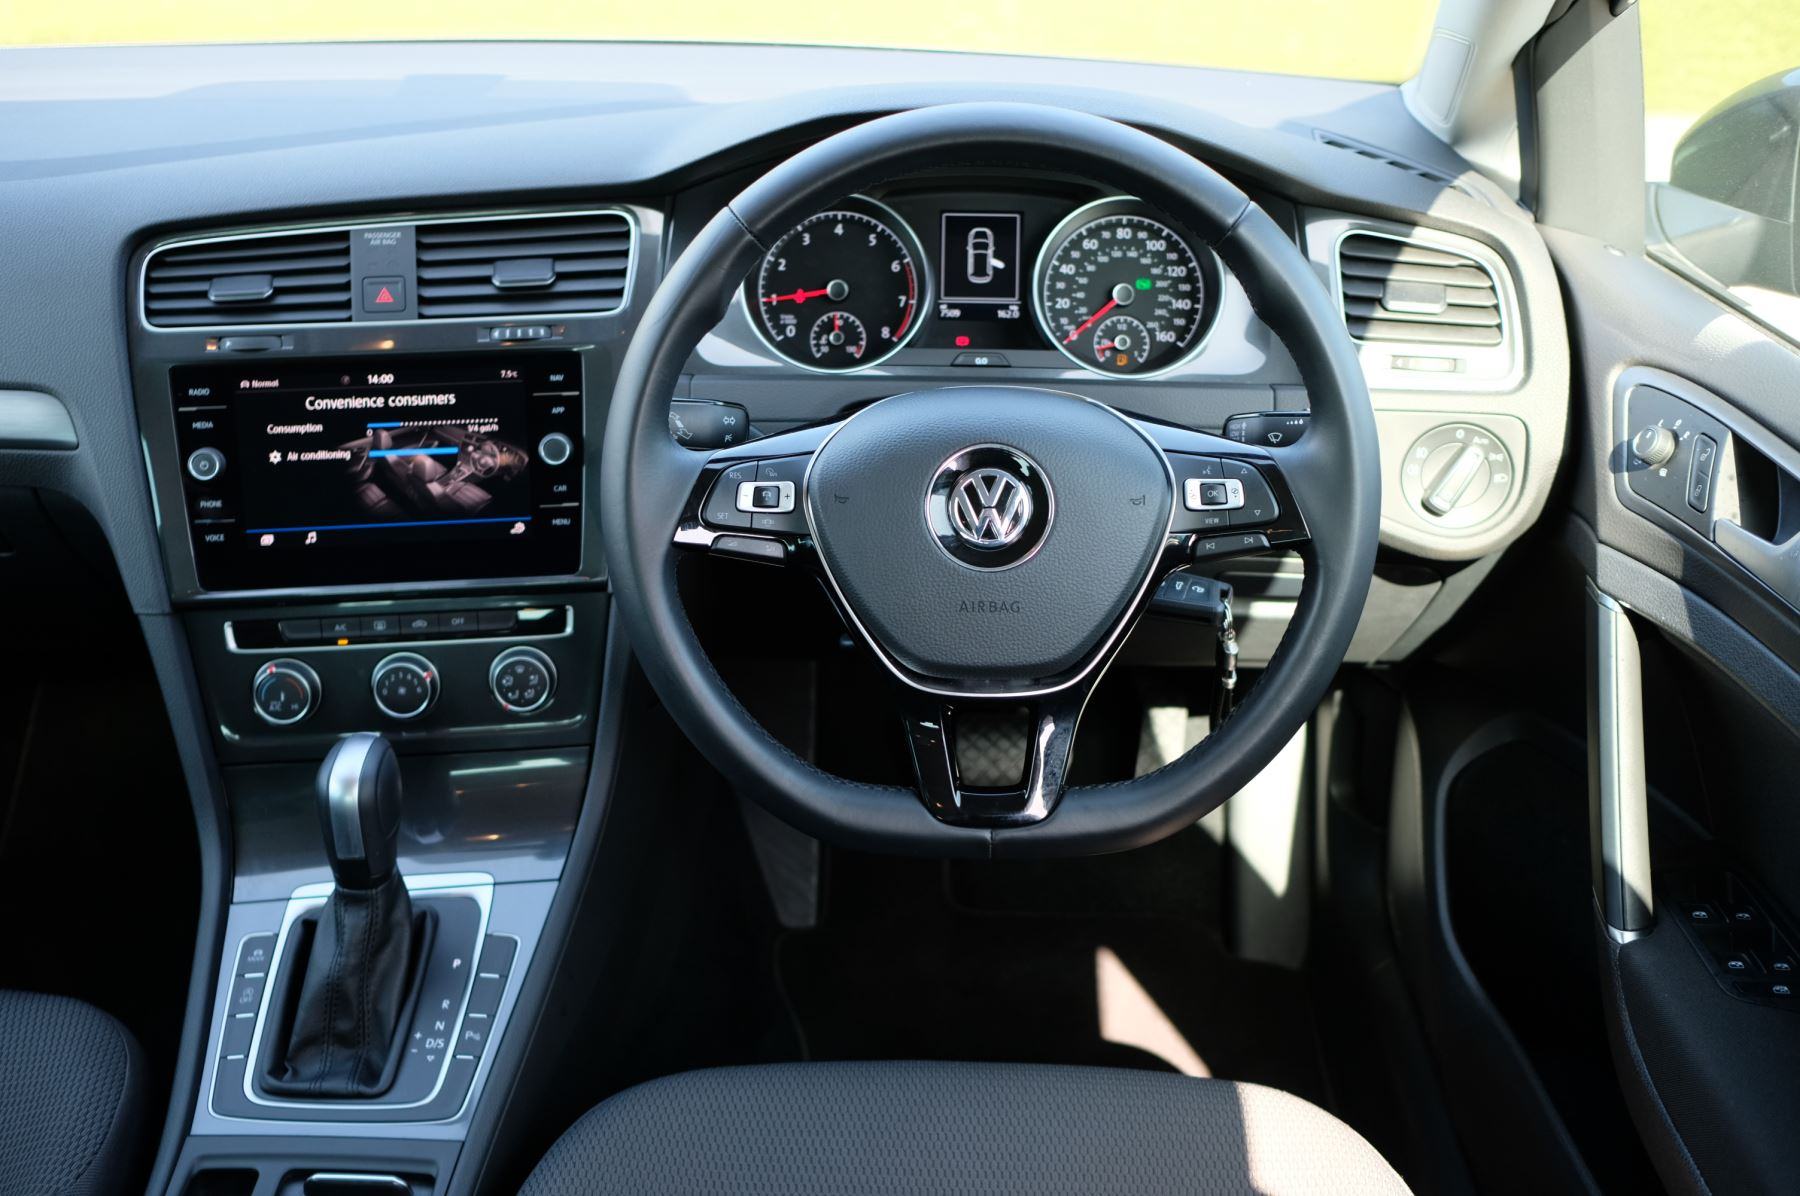 Volkswagen Golf 1.5 TSI EVO 150hp Match 5 Door DSG Auto with A/Con, Sat Nav, Alloys & Adaptive Cruise  image 11